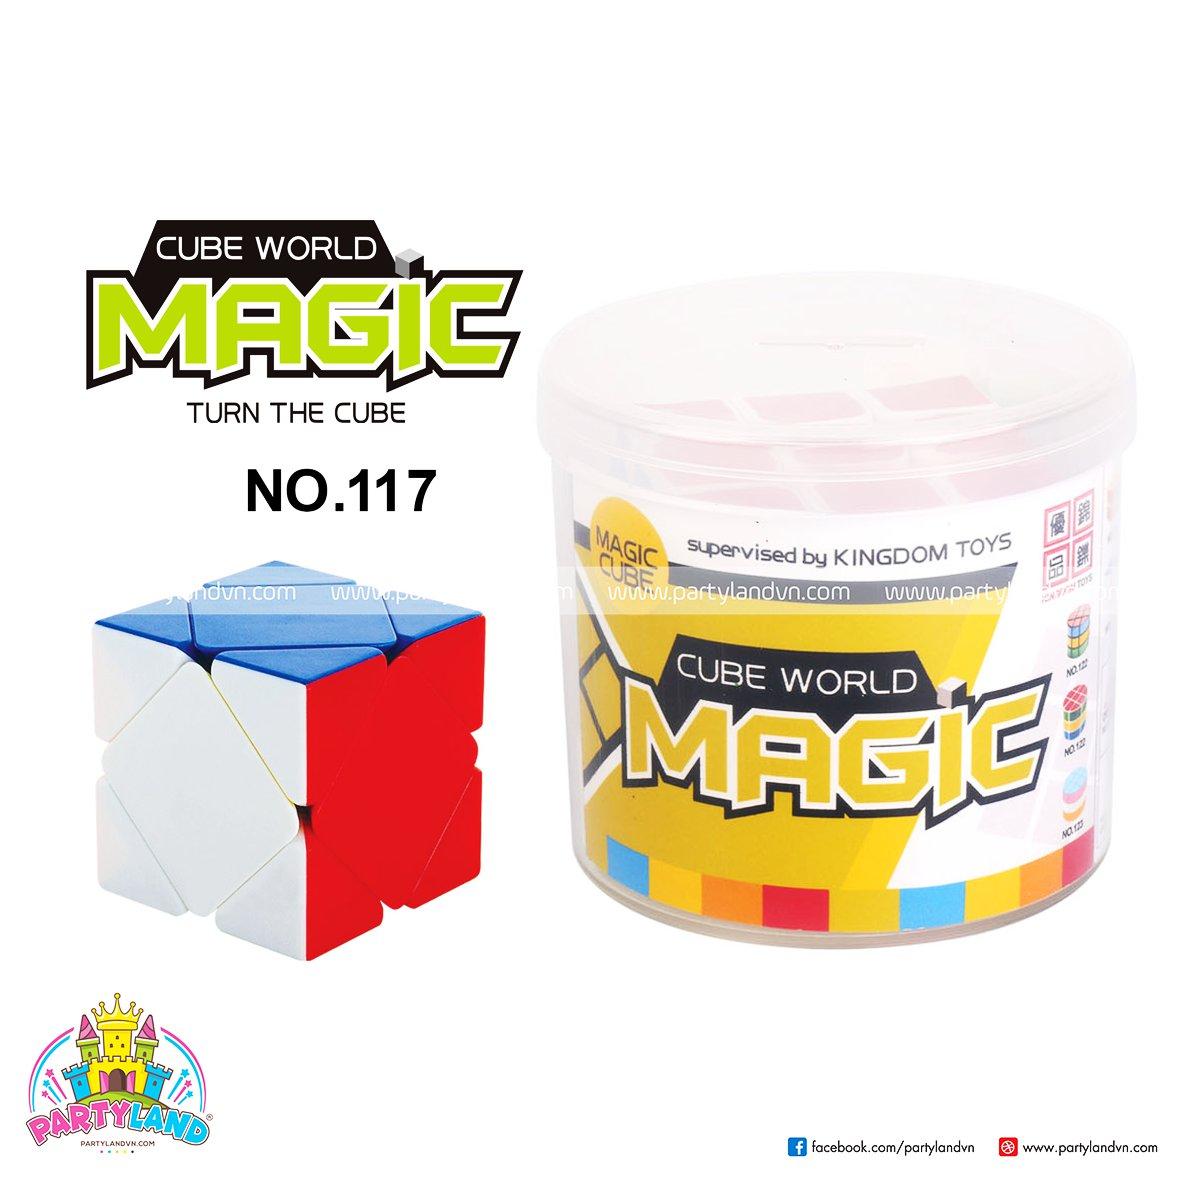 2191-Rupik91-No117-01